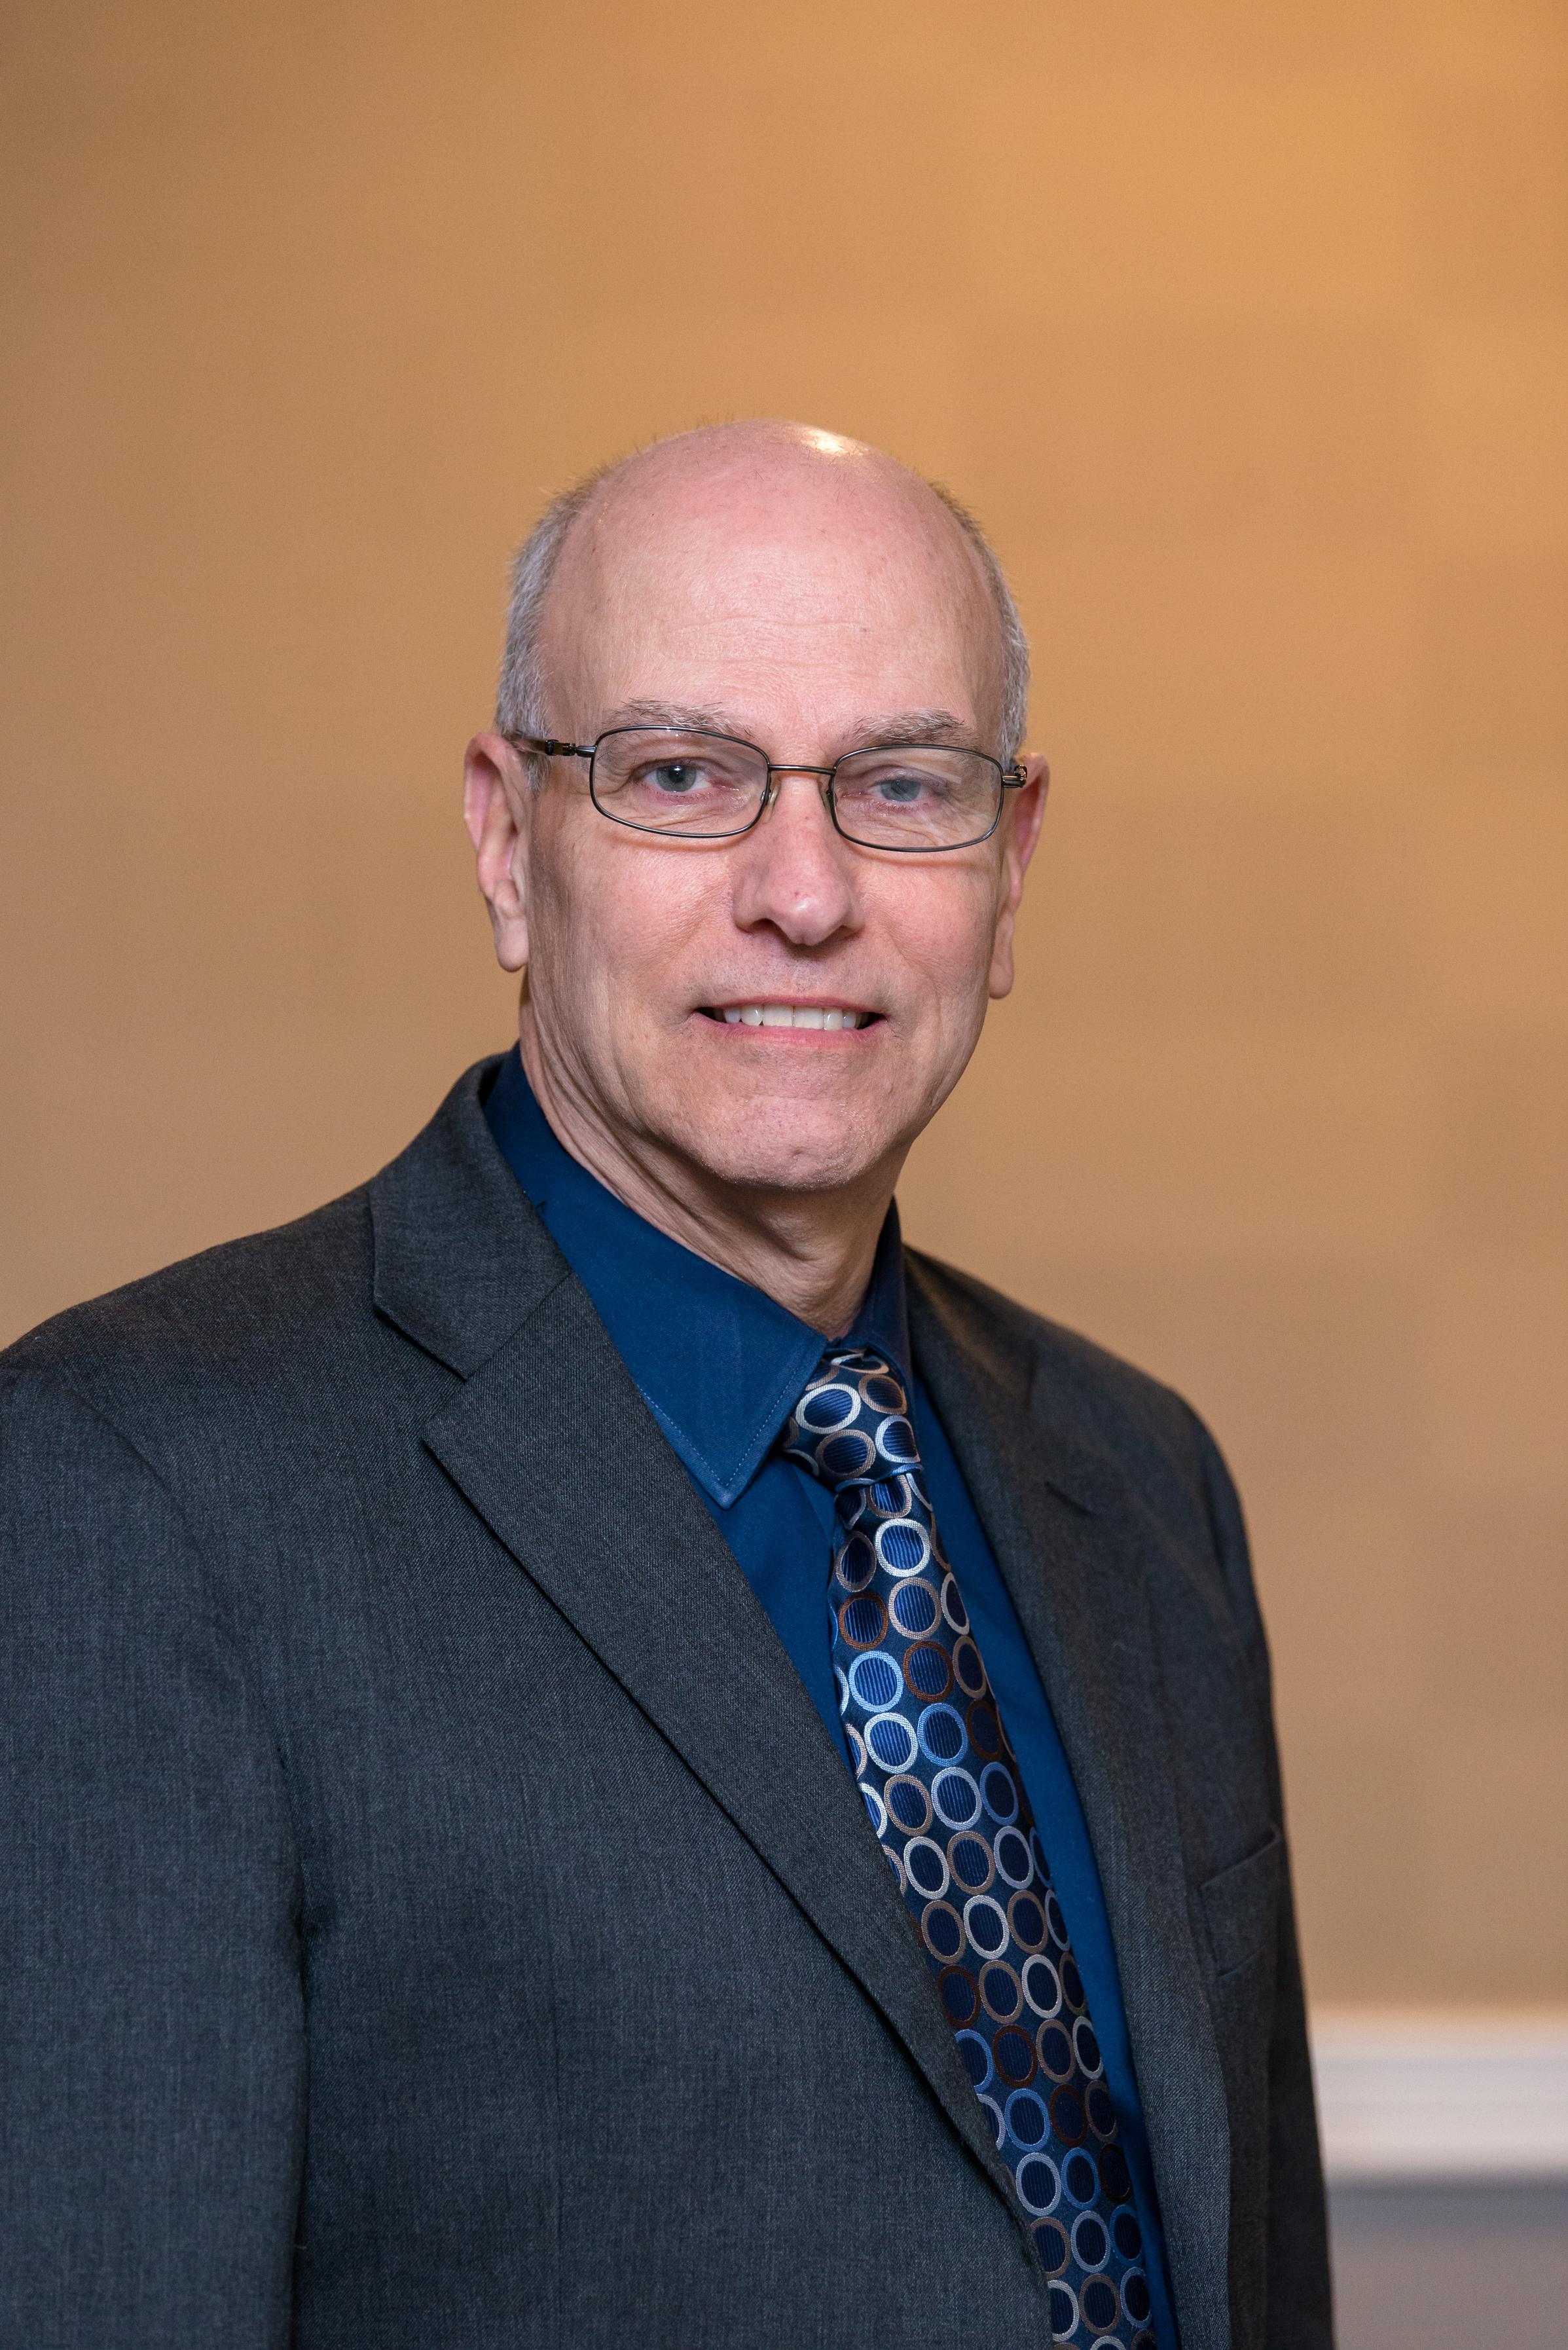 Professor George Chase